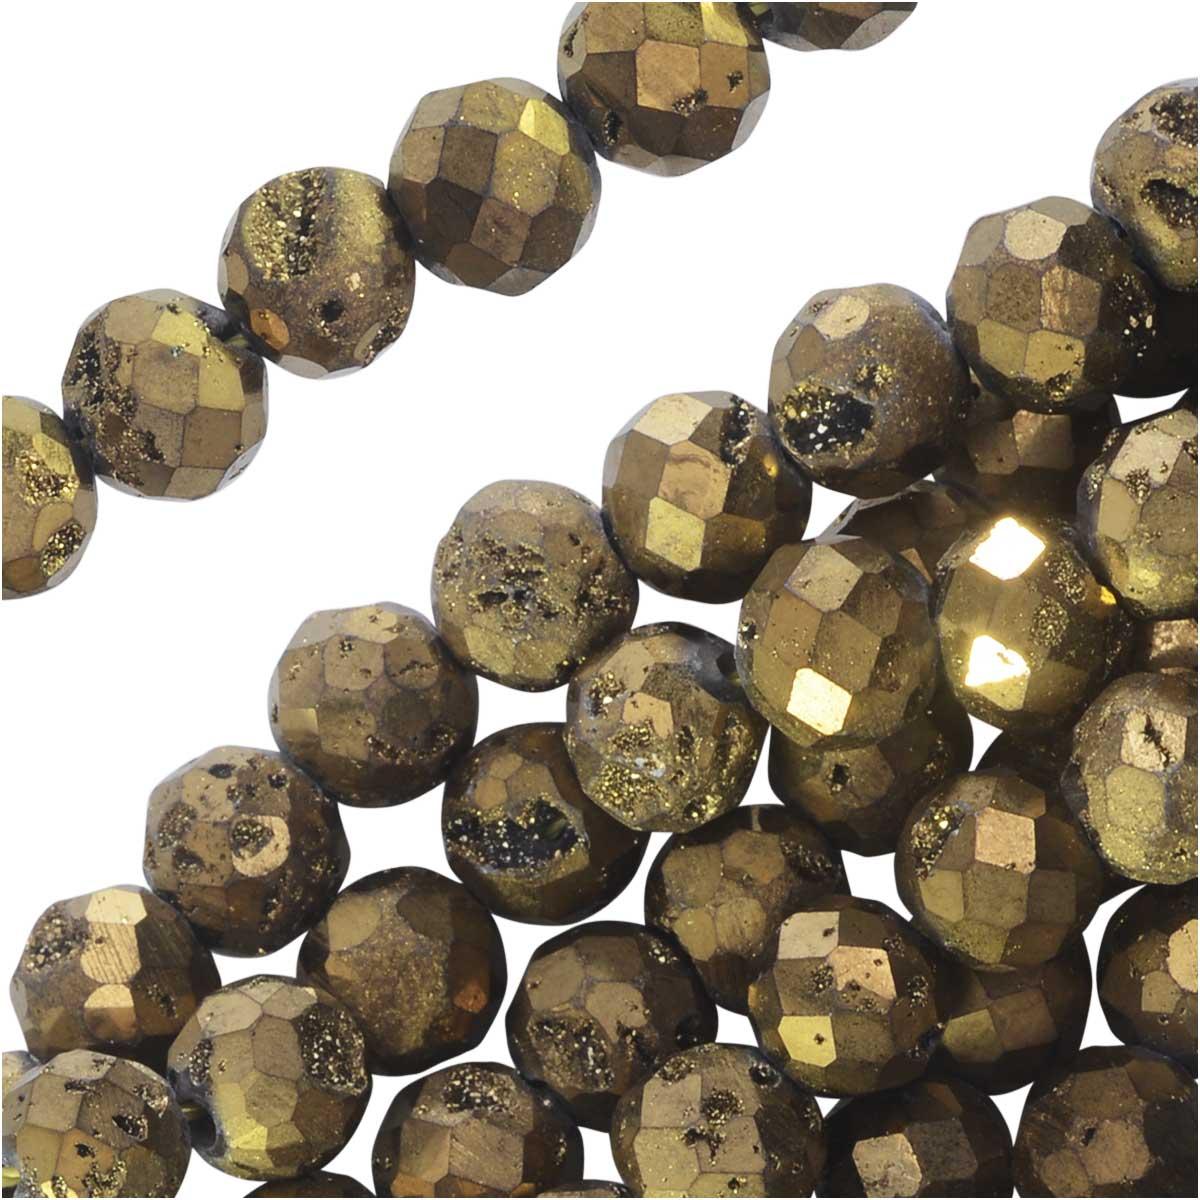 Dakota Stones Gemstone Beads, Agate Geode Druzy, Faceted Round 6mm, 8 Inch Strand, Metallic Gold